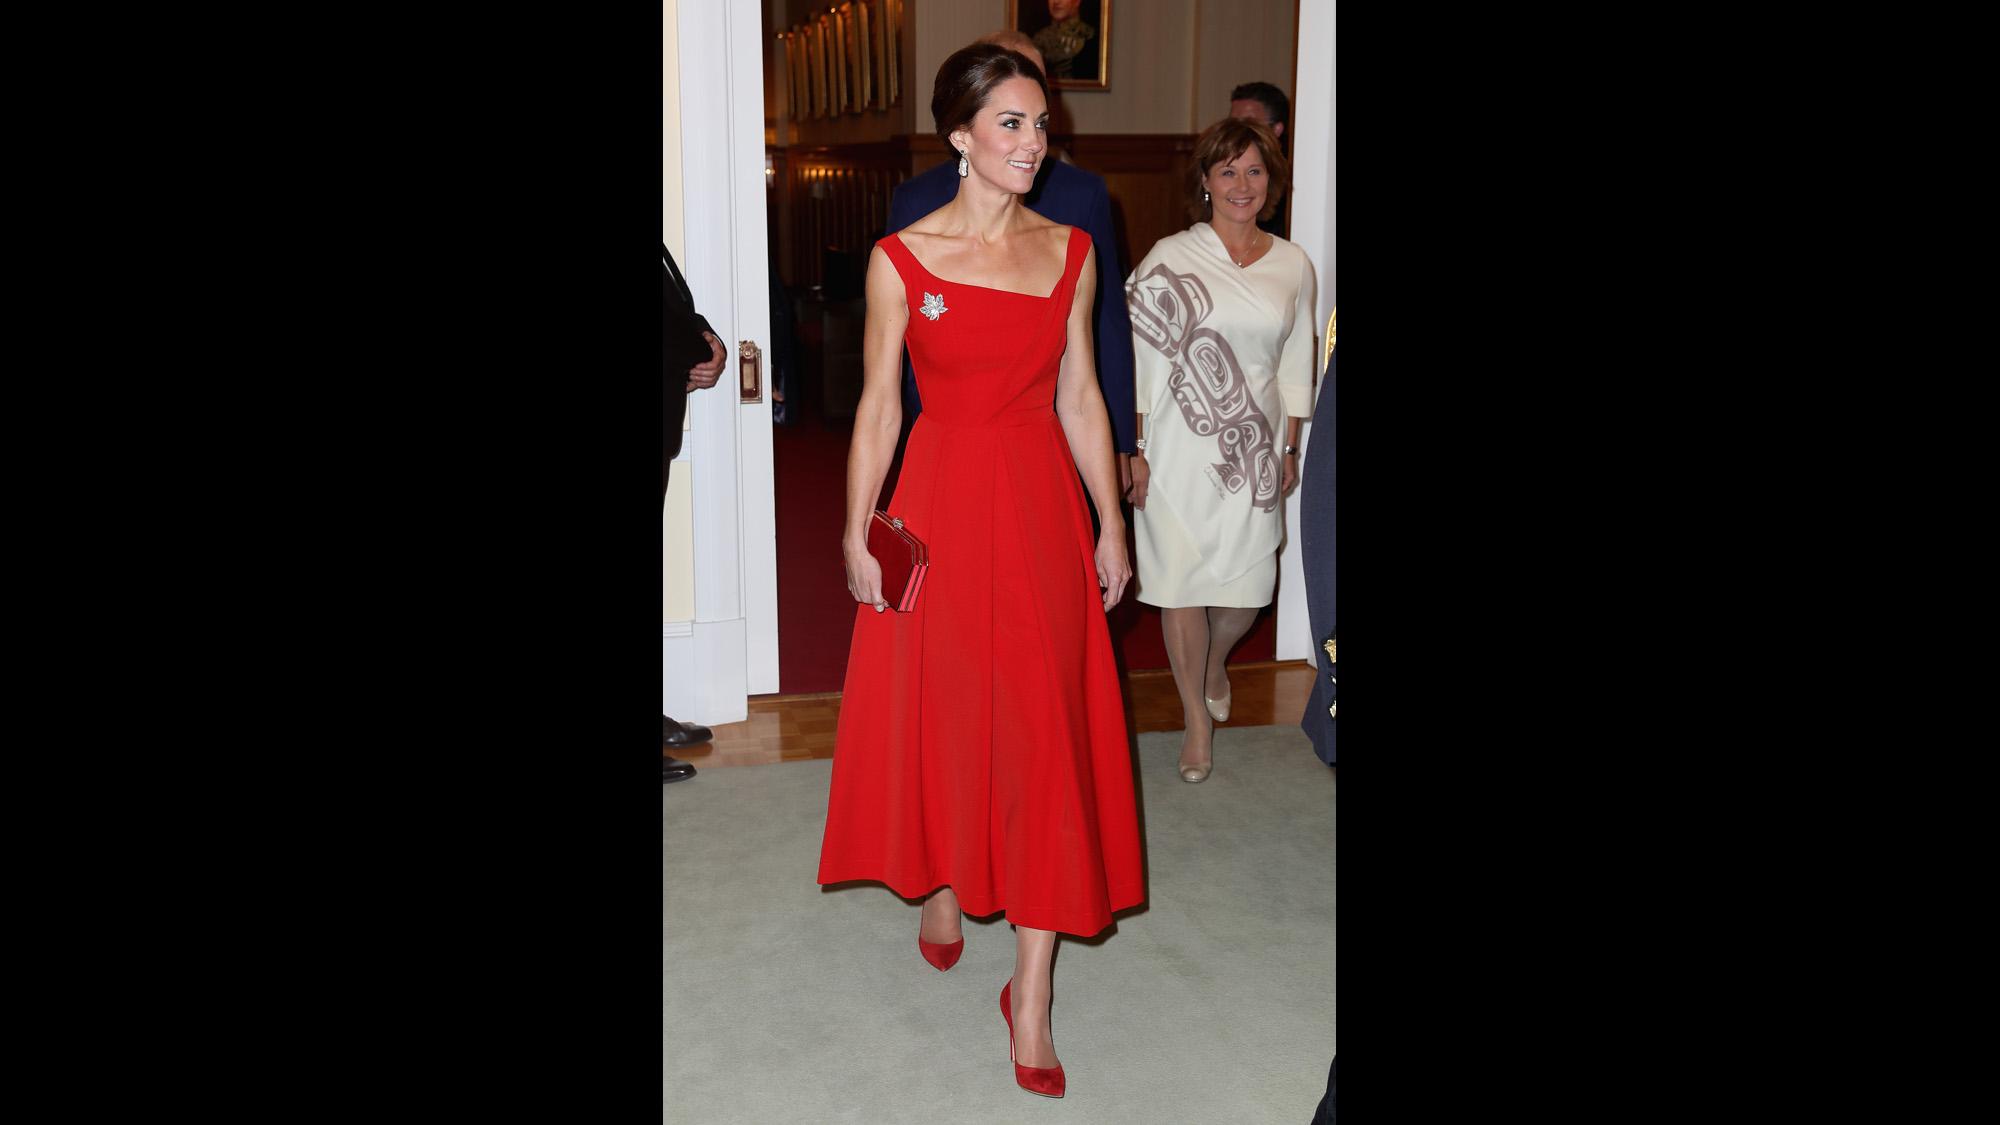 Na national treasure 2 diane kruger whitehouse dress mid bmp - Na National Treasure 2 Diane Kruger Whitehouse Dress Mid Bmp 4